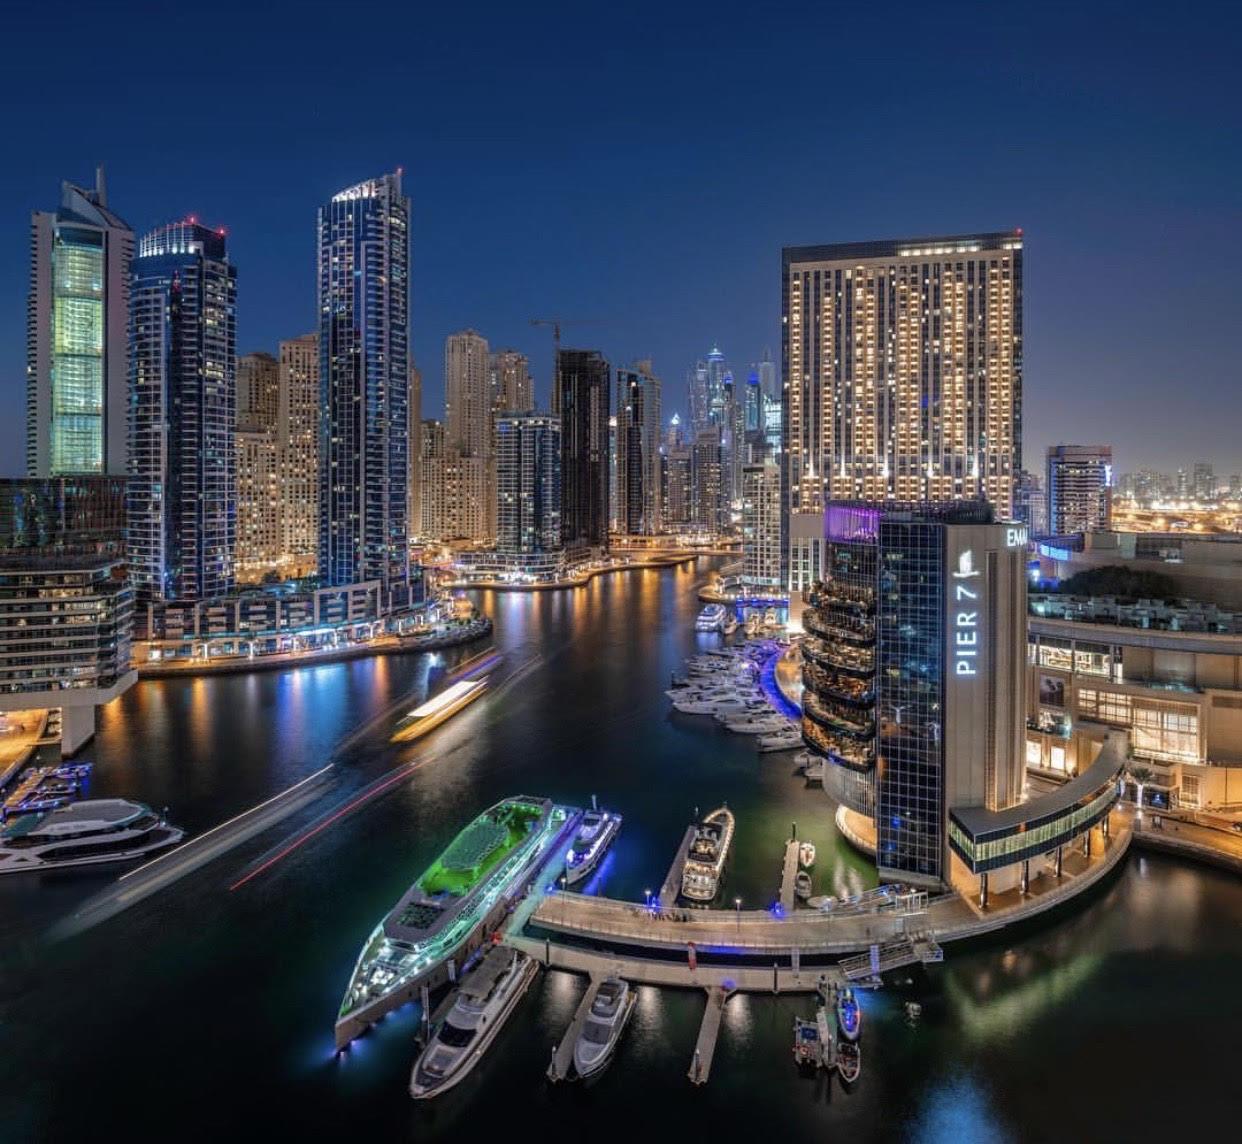 the-world's-largest-man-made-marina,-the-dubai-marina